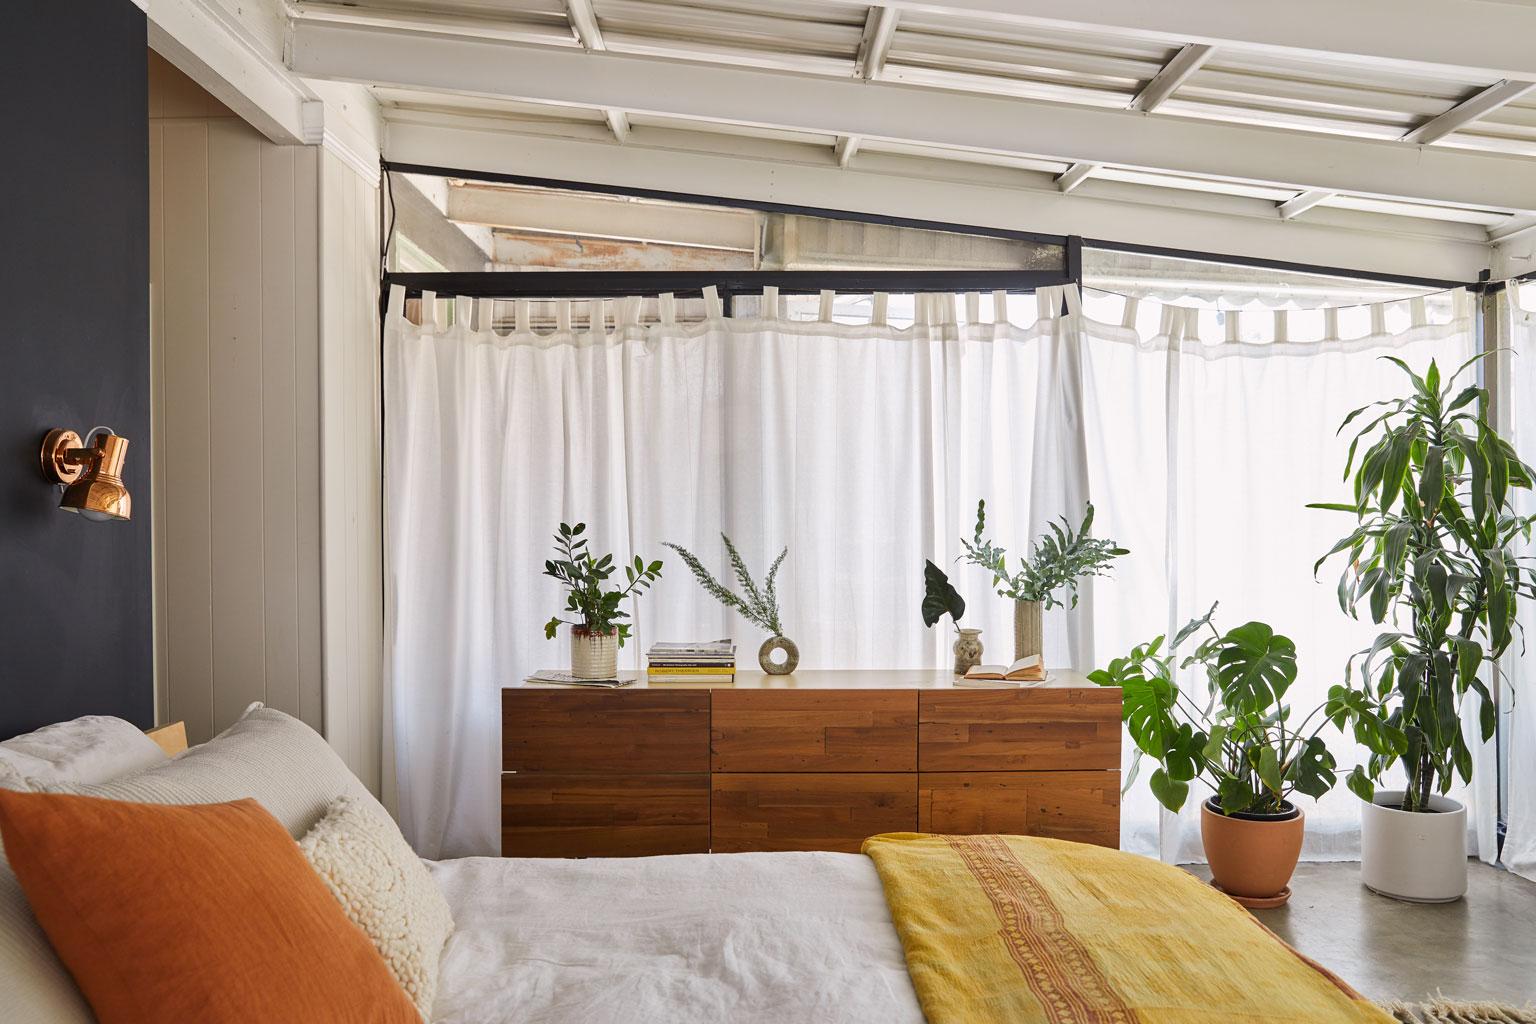 Apartment-List_Day1_0882-2.jpg